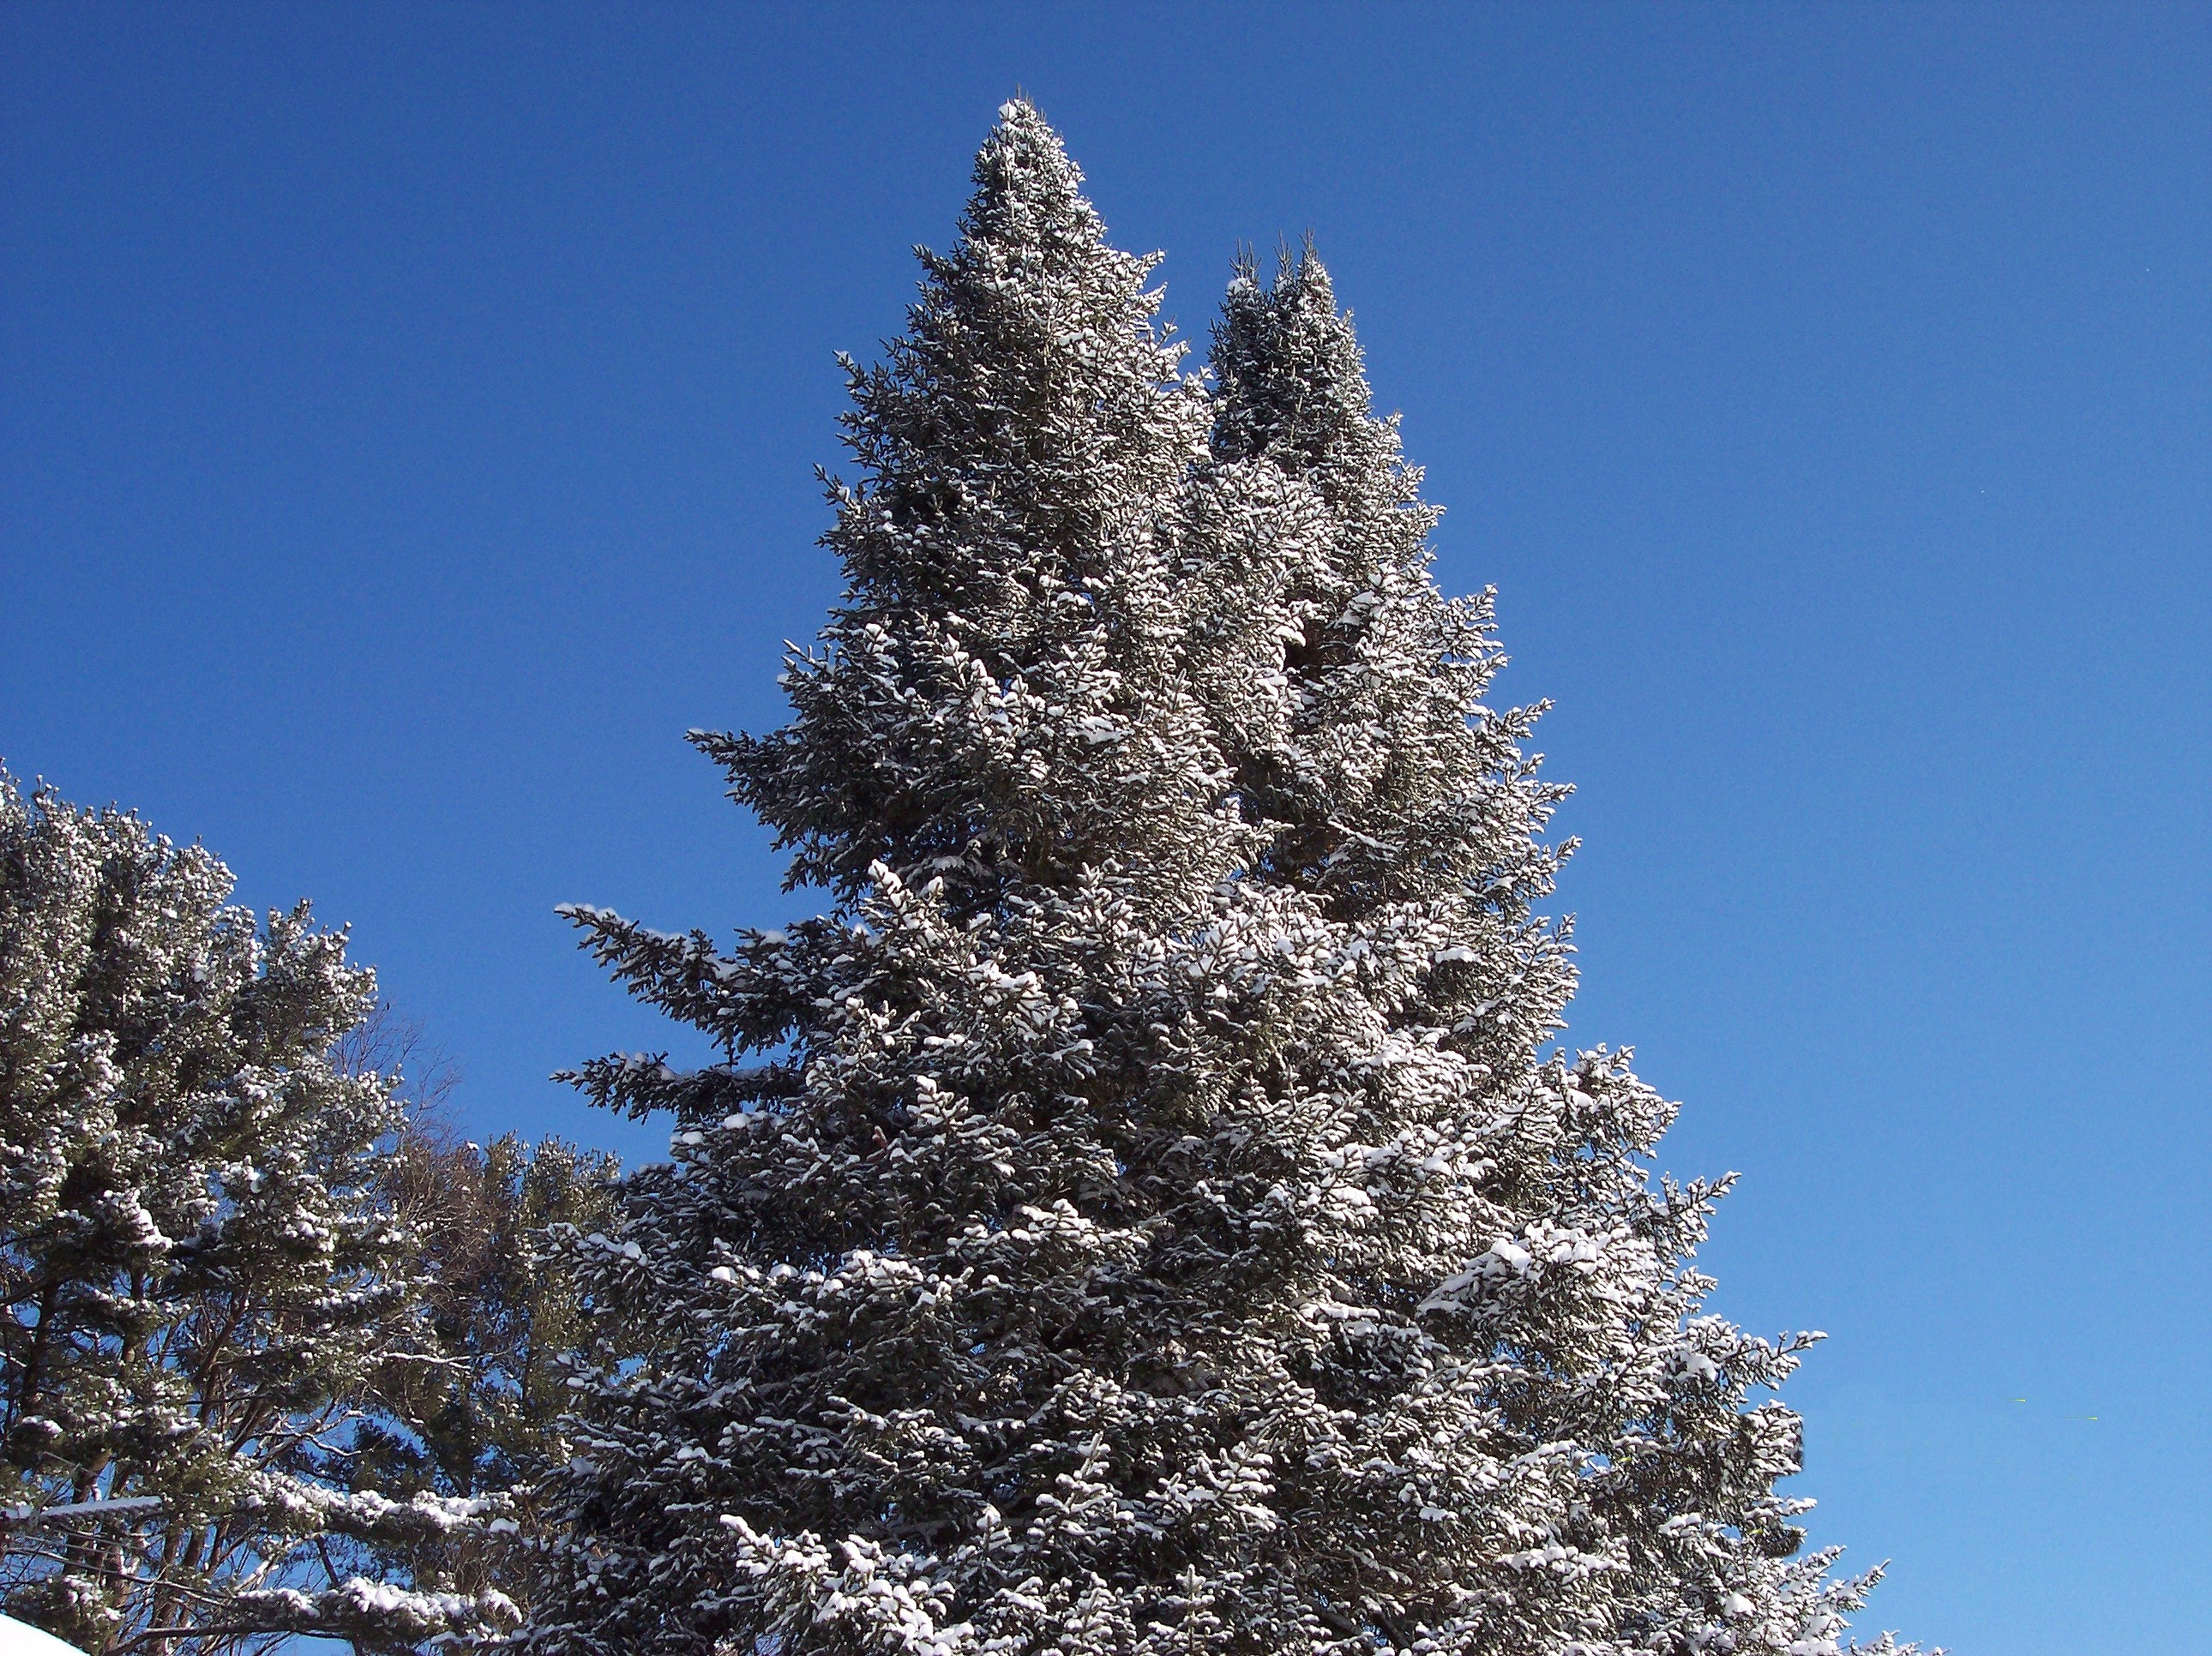 Holiday blues, Christmas stress